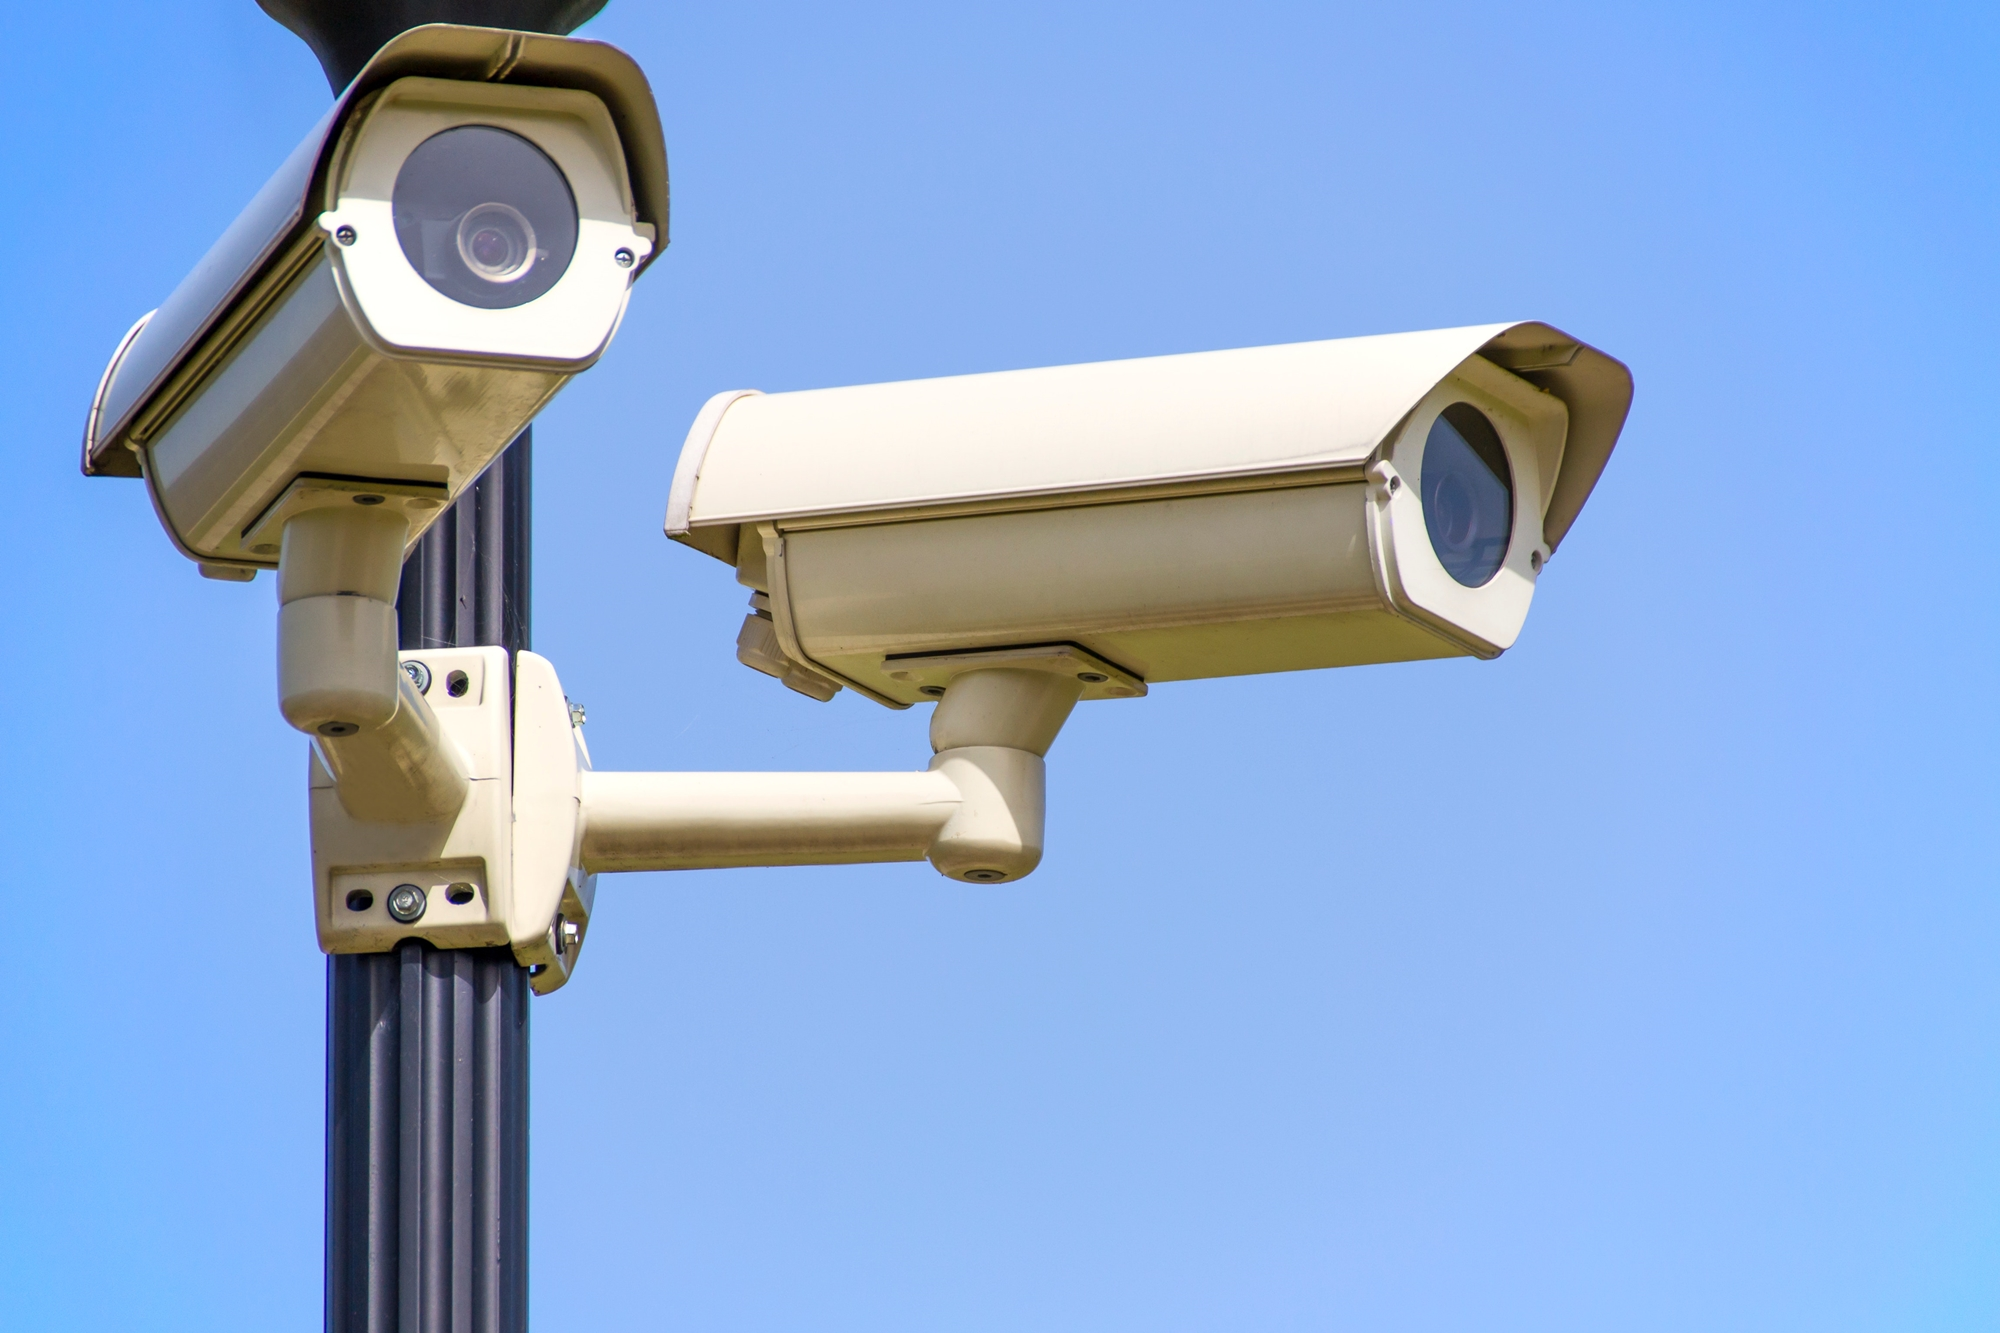 cctv_security_Camera_orbex-solutions